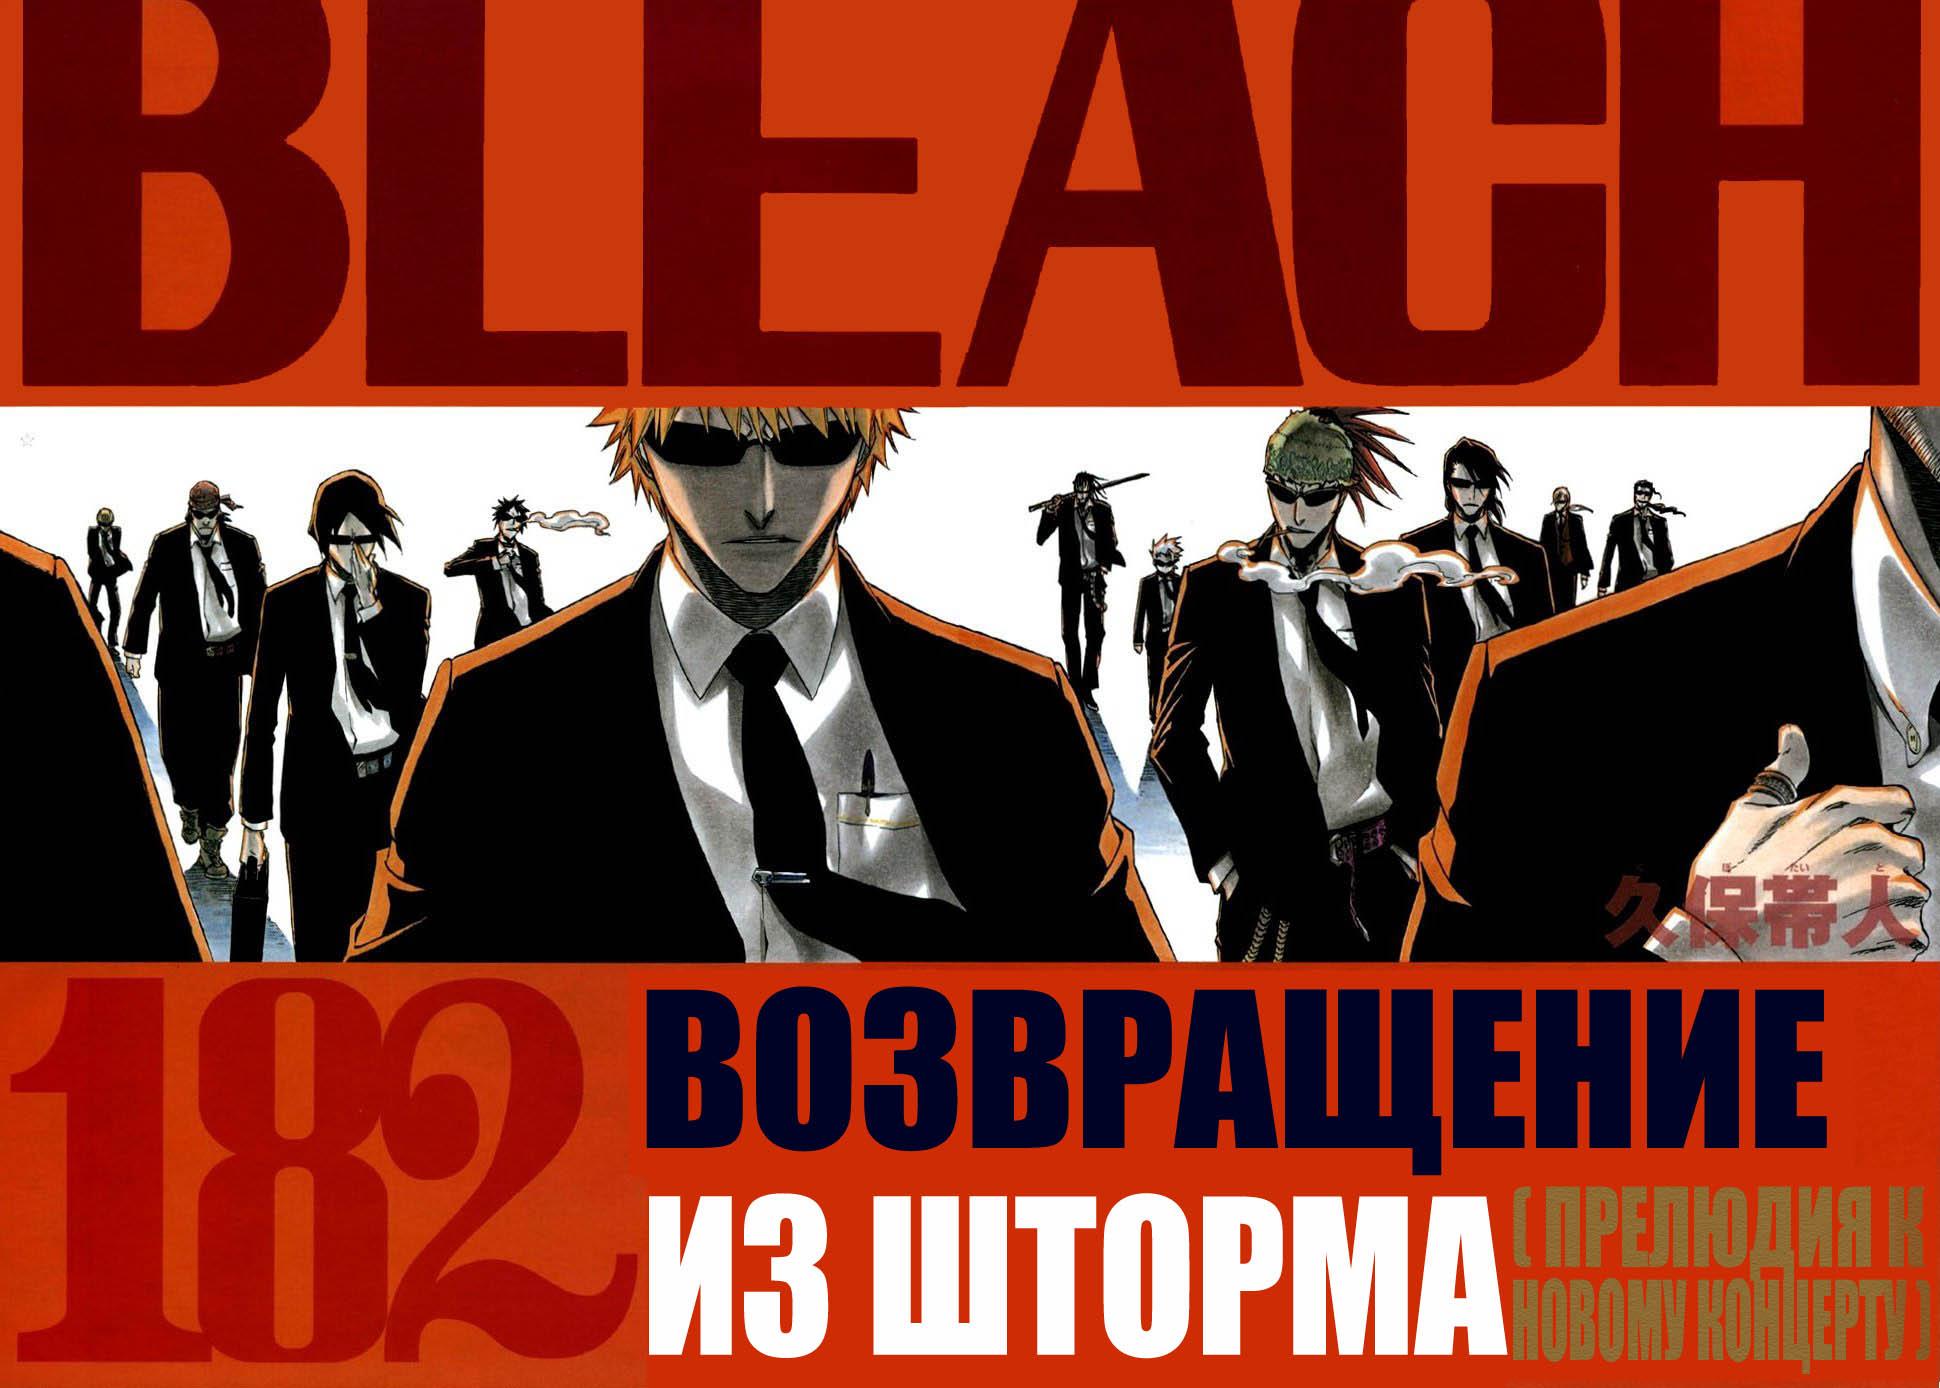 Манга Bleach / Блич Манга Bleach Глава # 182 - Возвращение из шторма, страница 1